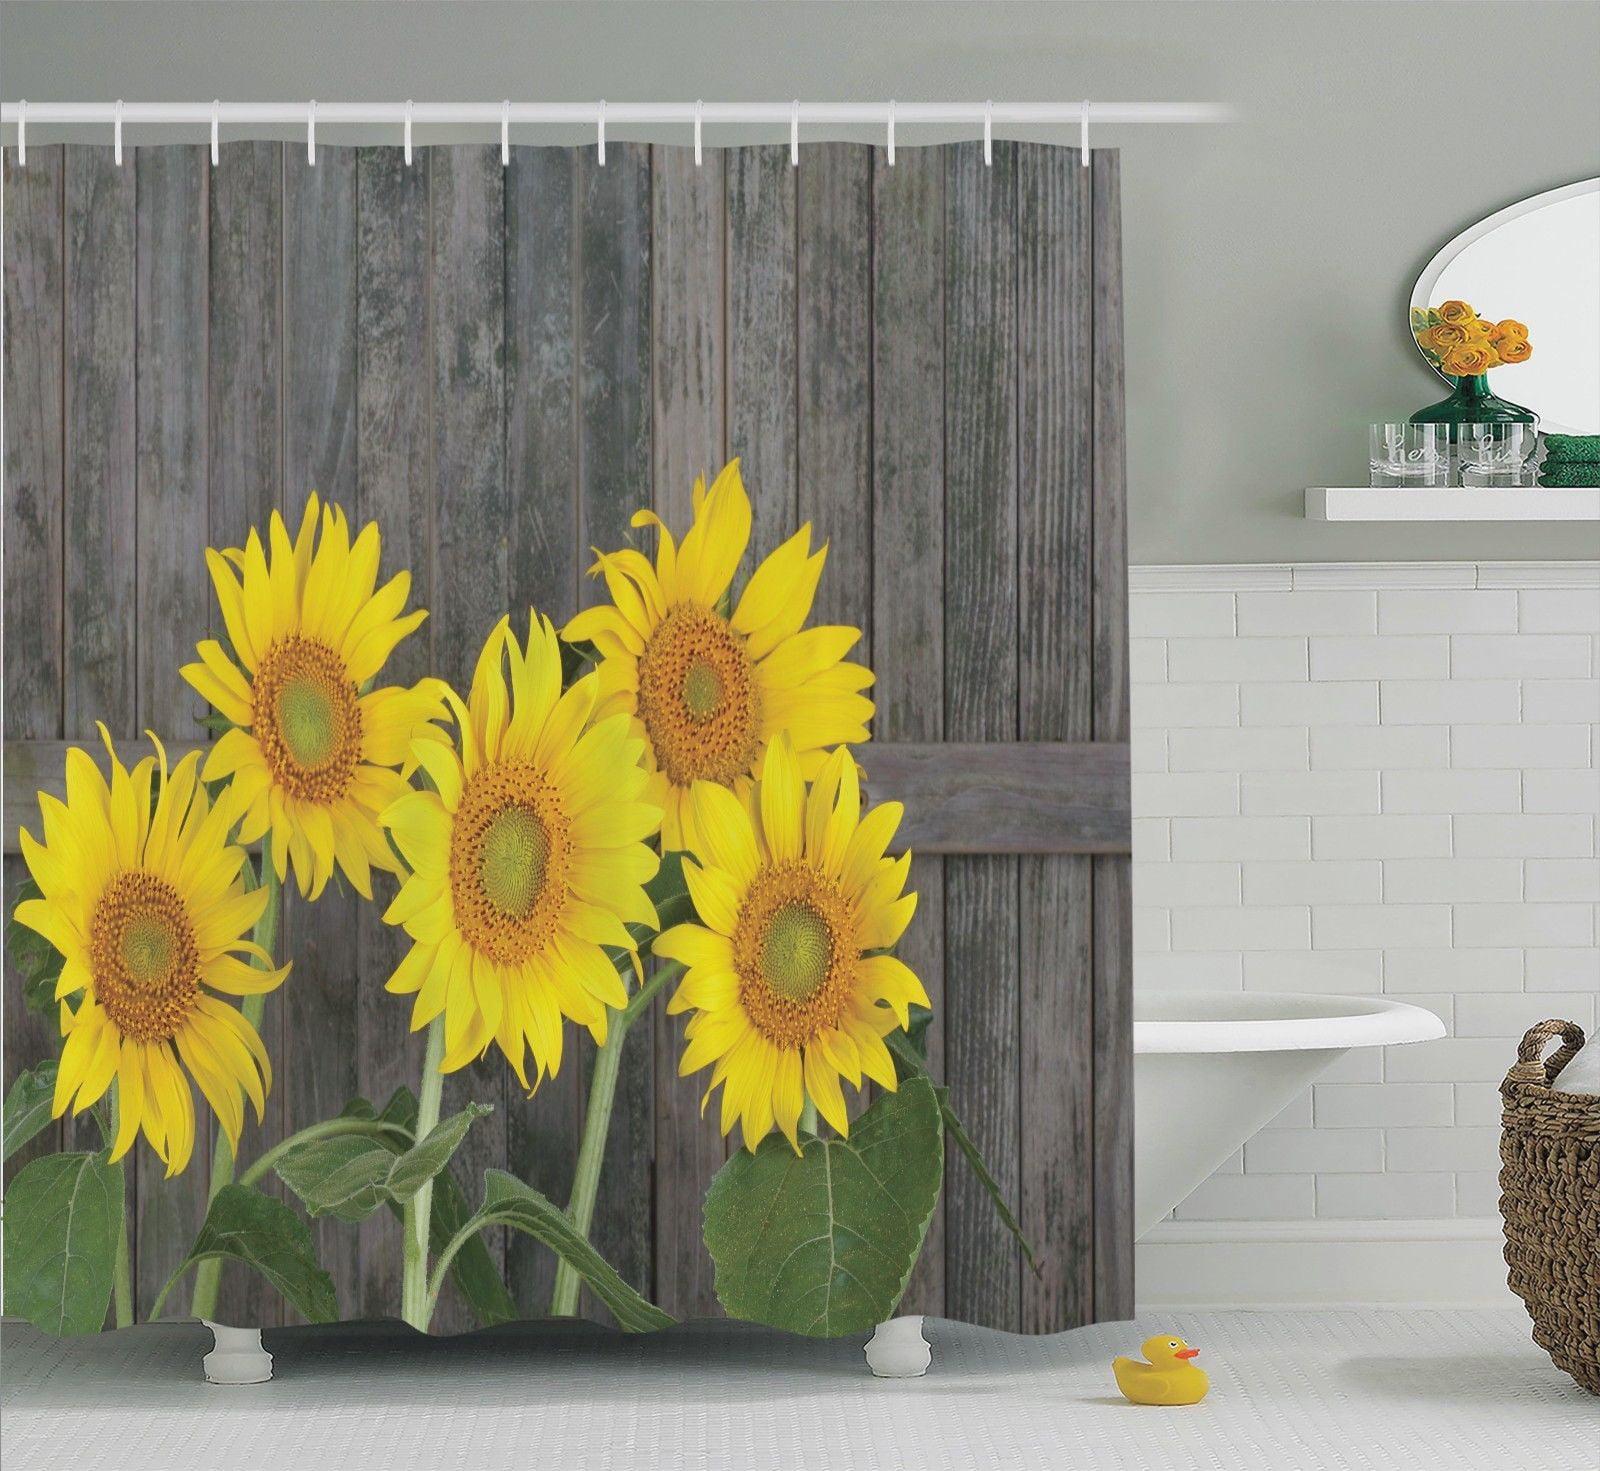 Sunflower Decor Shower Curtain Set Helianthus Sunflowers